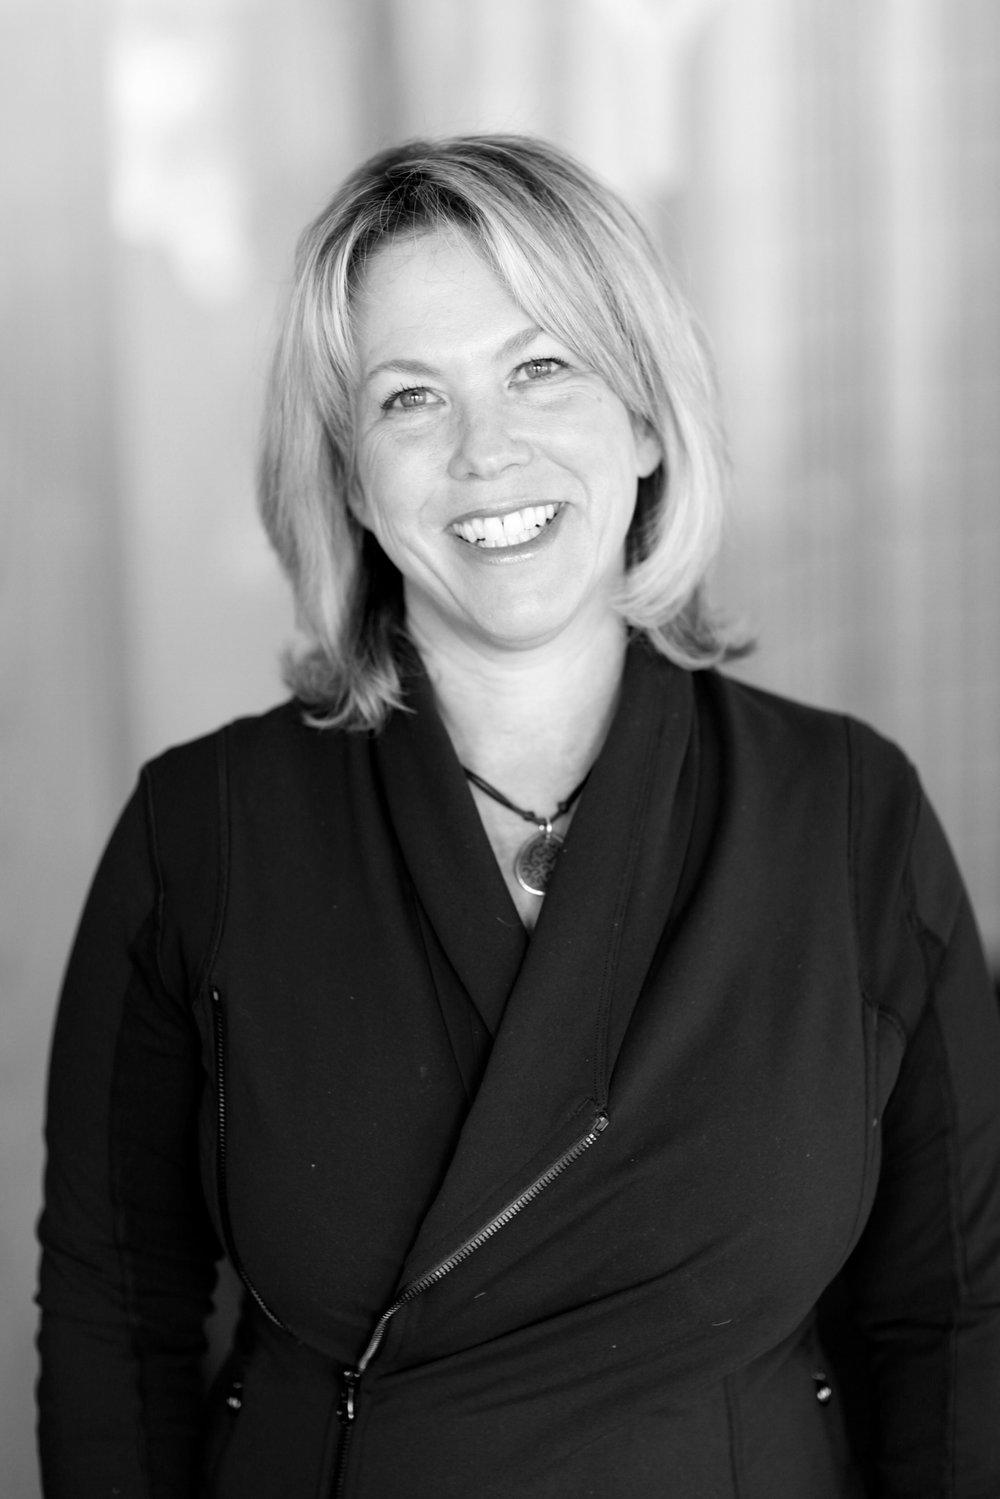 Alison DeNicola